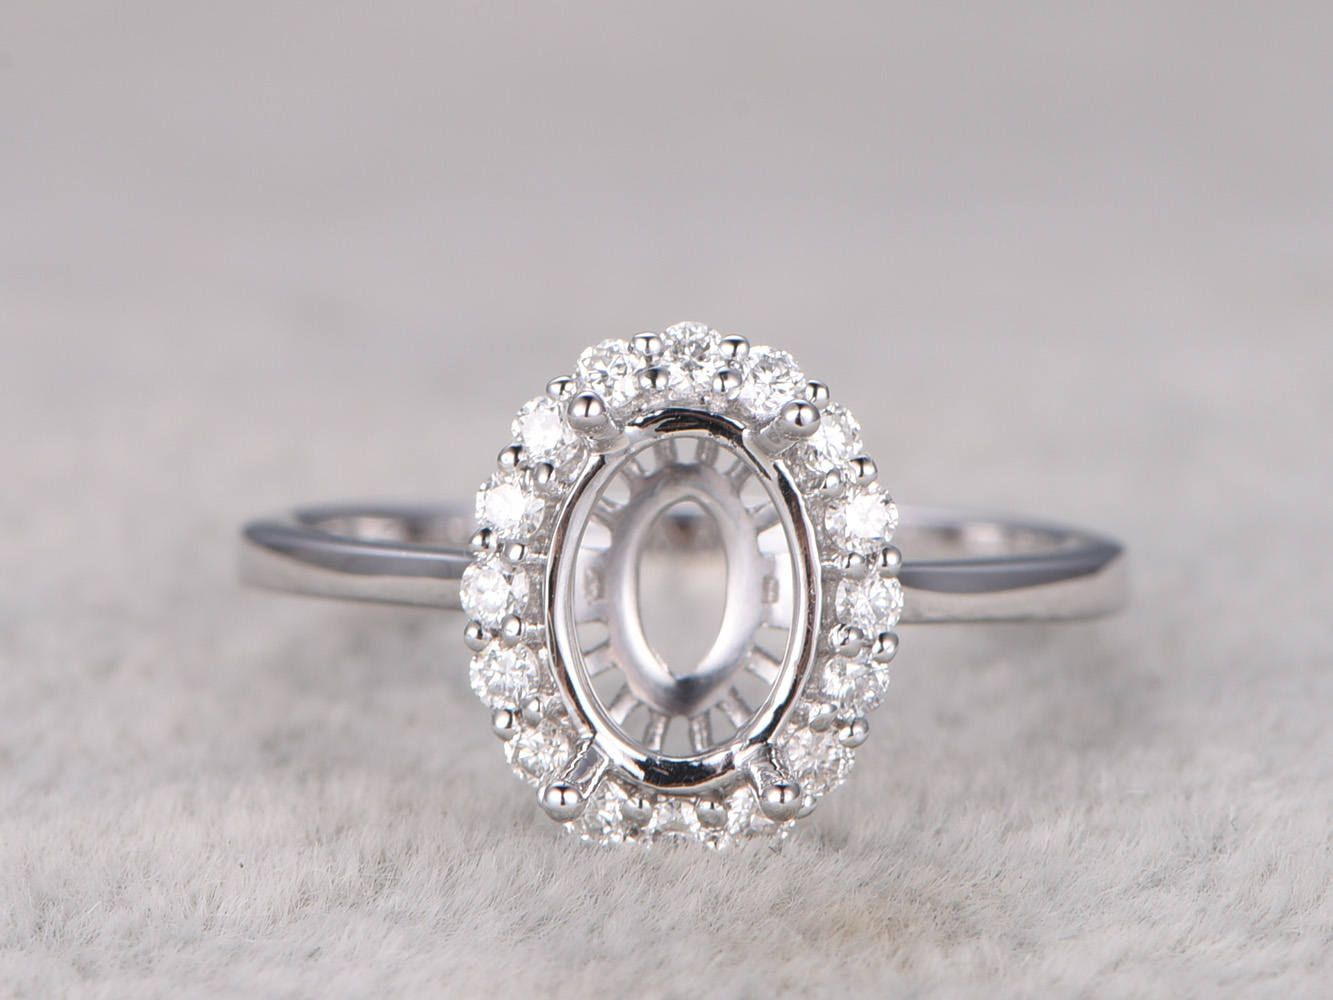 8x6mm Oval Stone Semi Mount RingWhite Gold Ring Setting14kDiamond Halo